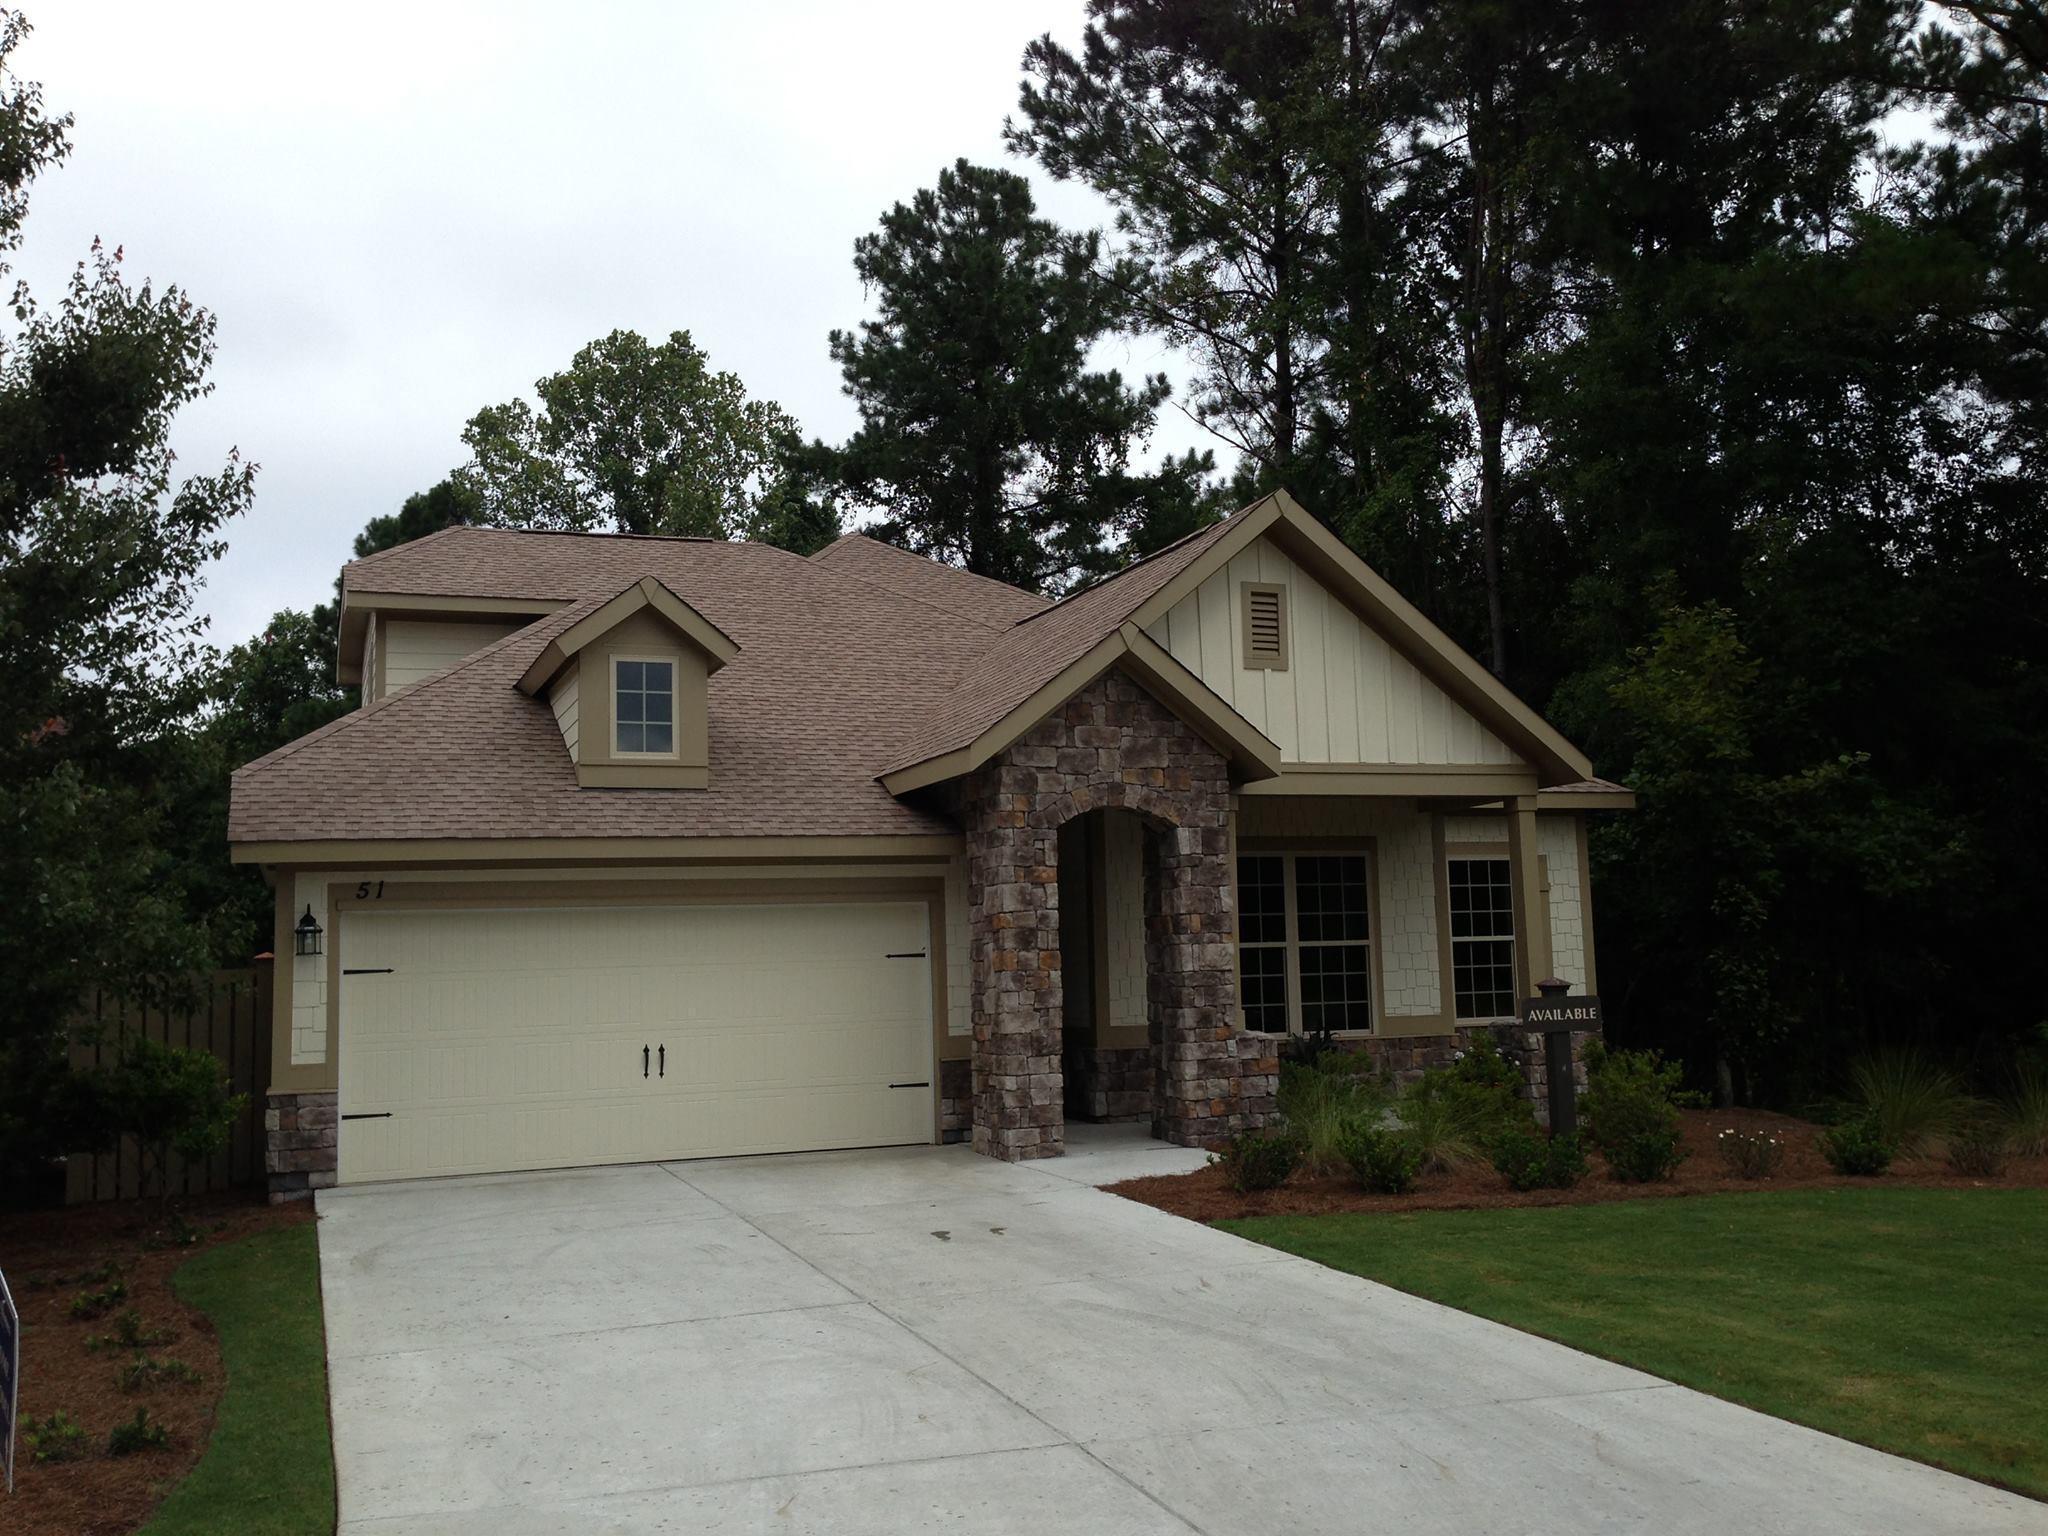 RoofCrafters-Savannah image 76